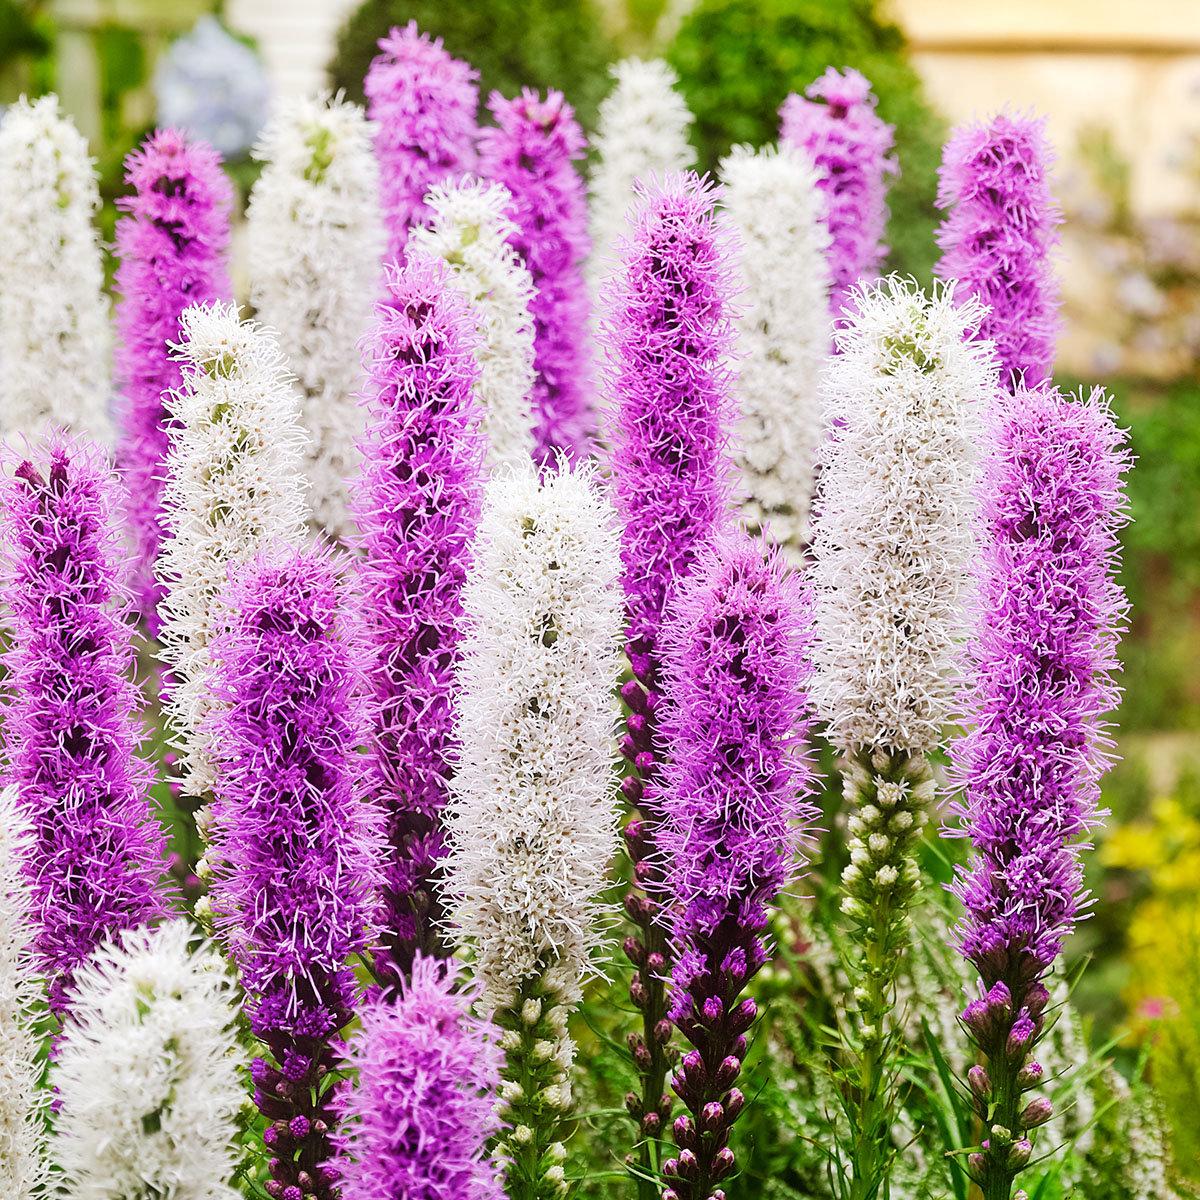 prachtscharten violett wei e mischung online kaufen bei g rtner p tschke. Black Bedroom Furniture Sets. Home Design Ideas